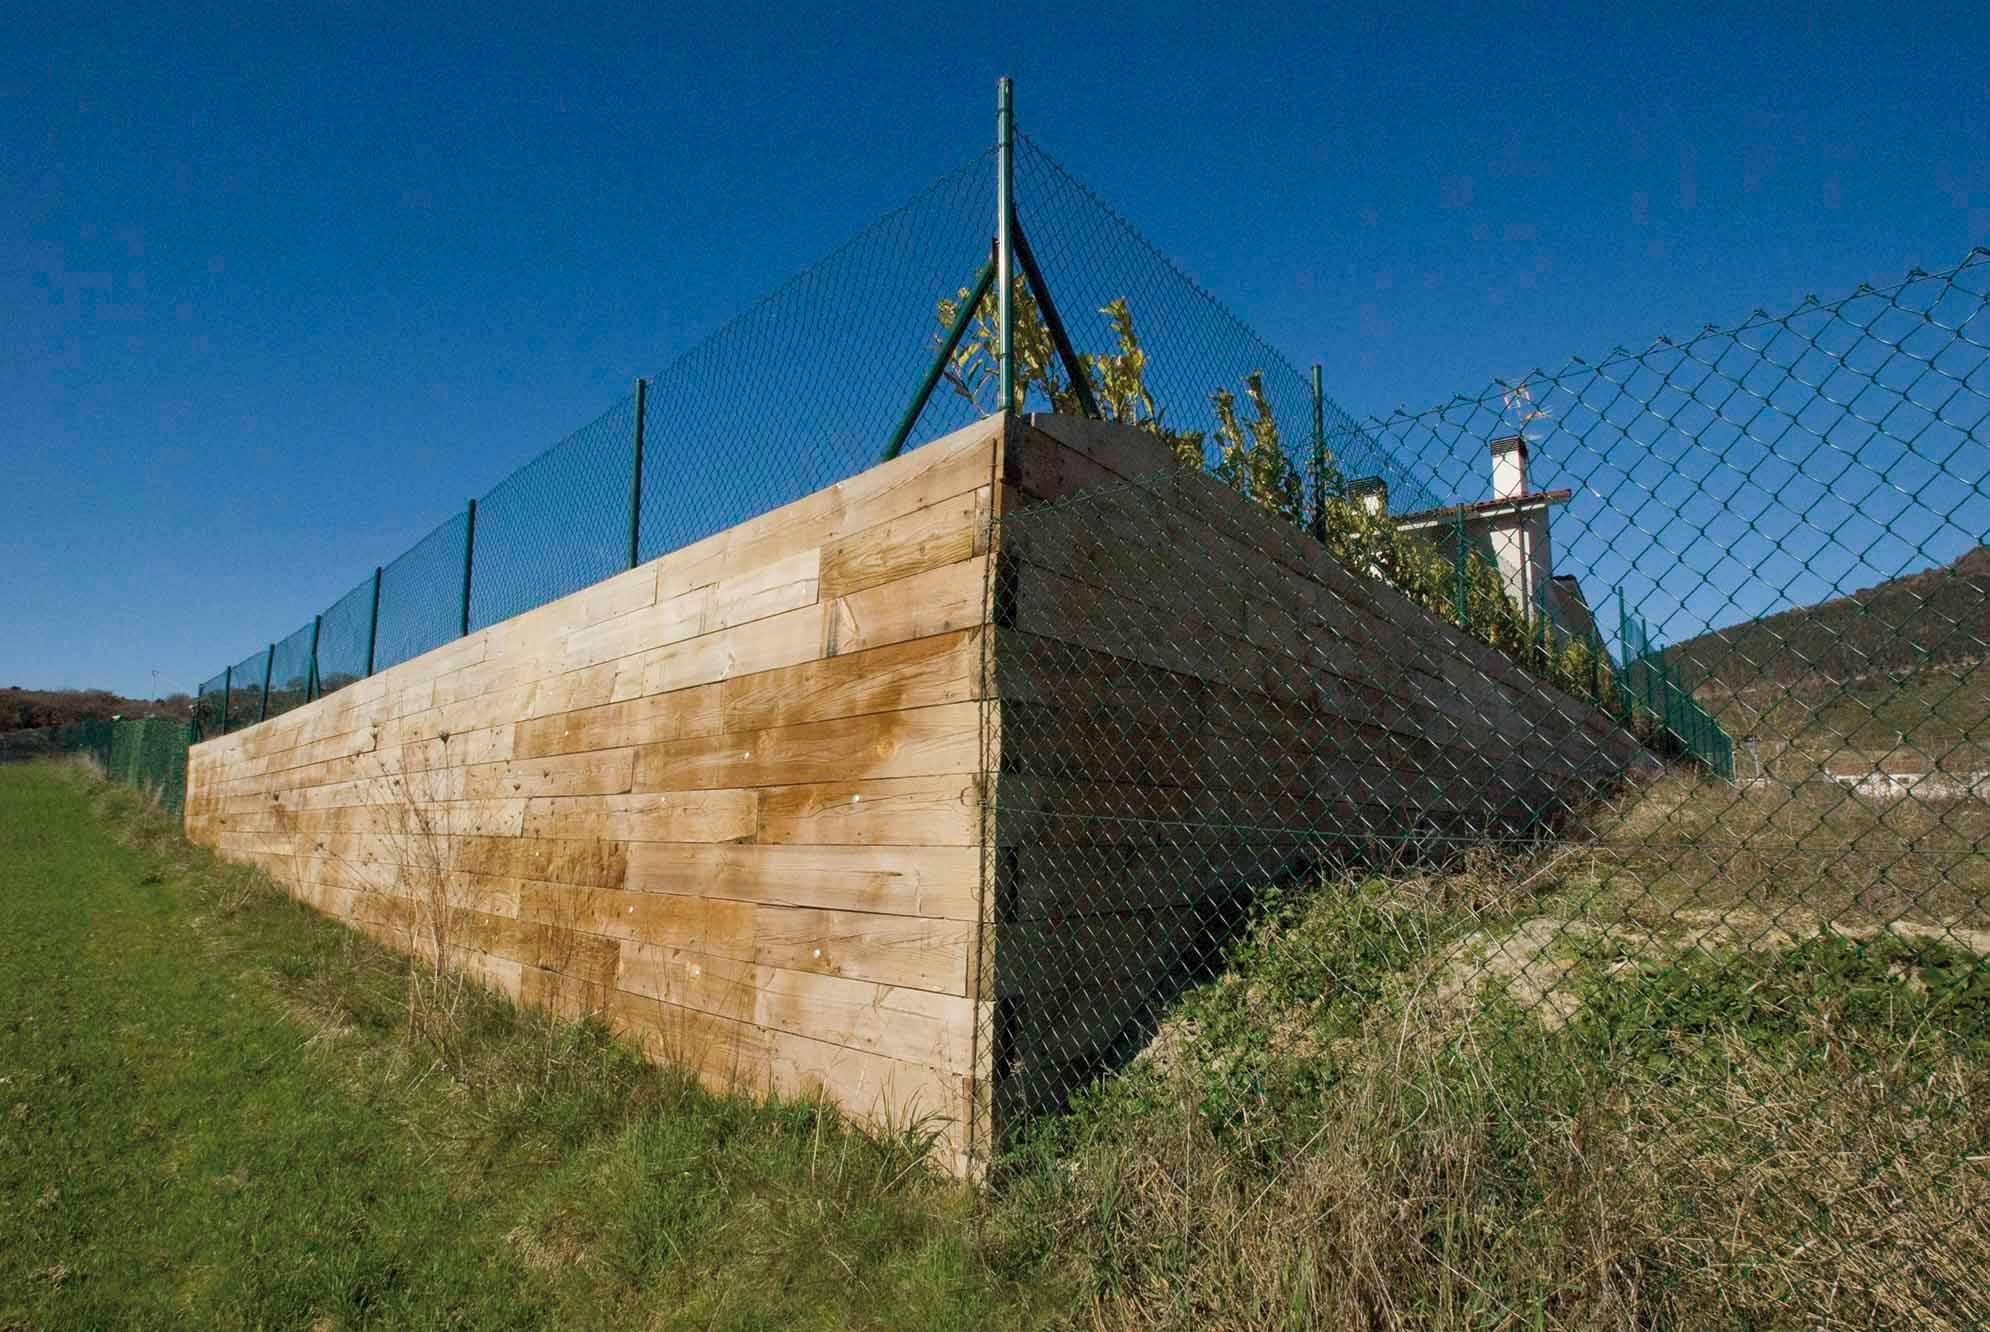 desnivel-jardin-muro-traviesas-navarra5